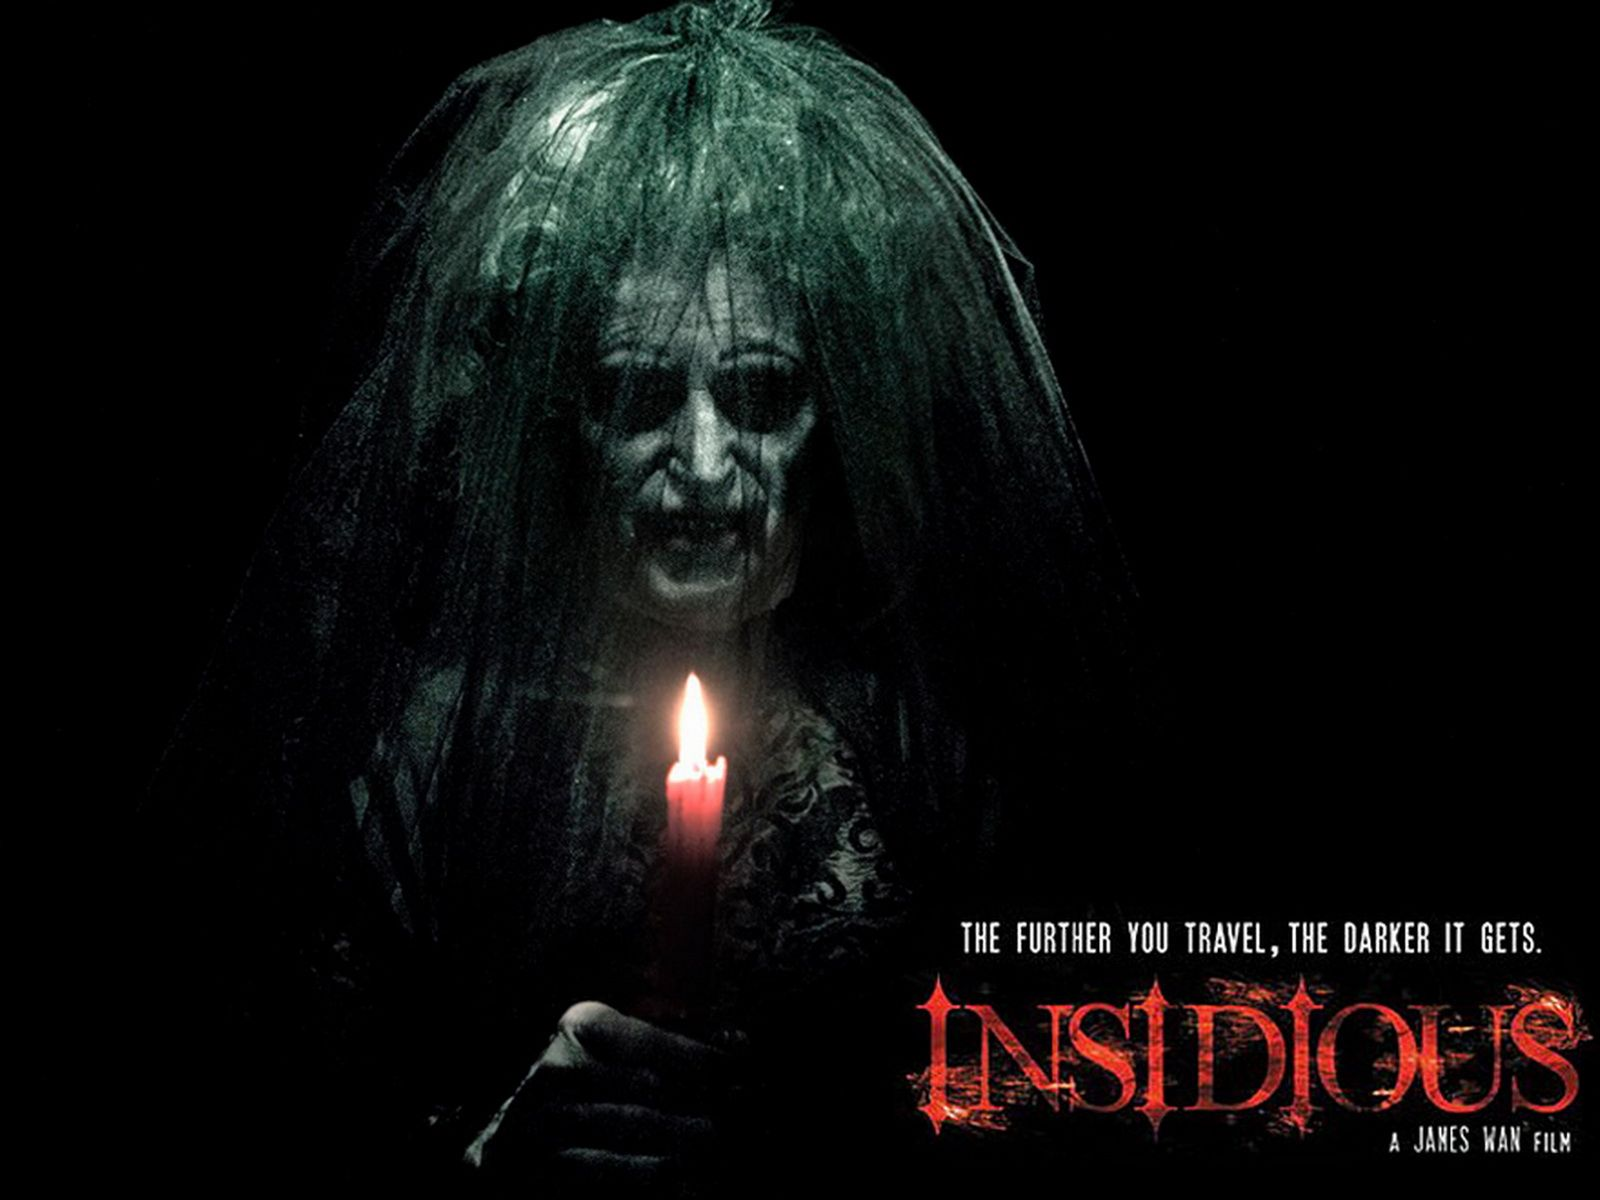 Insidious Vote4pakistan Insidious Movie Record Business In Box